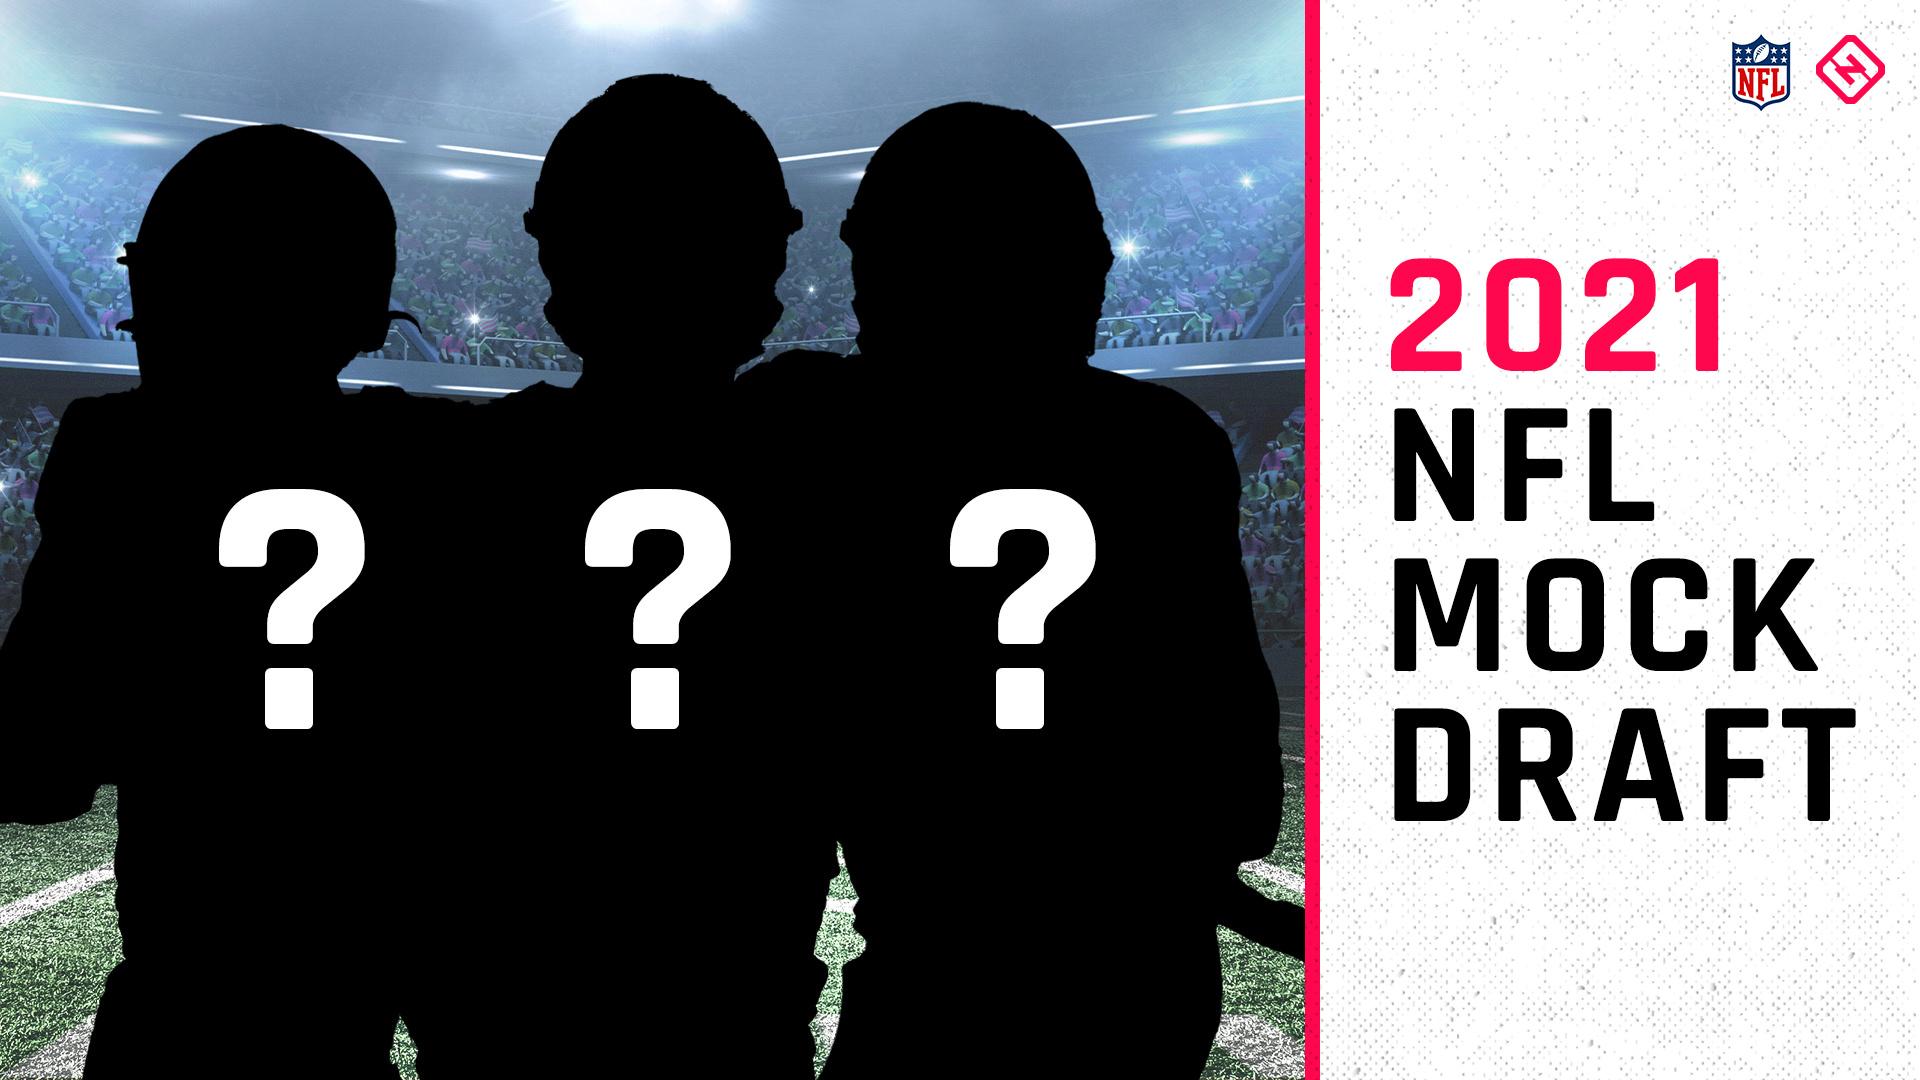 Draft da NFL para 2021: Deshaun Watson se destaca para Jets, Dolphins;  Cowboys, Patriots fazem escolhas luxuosas